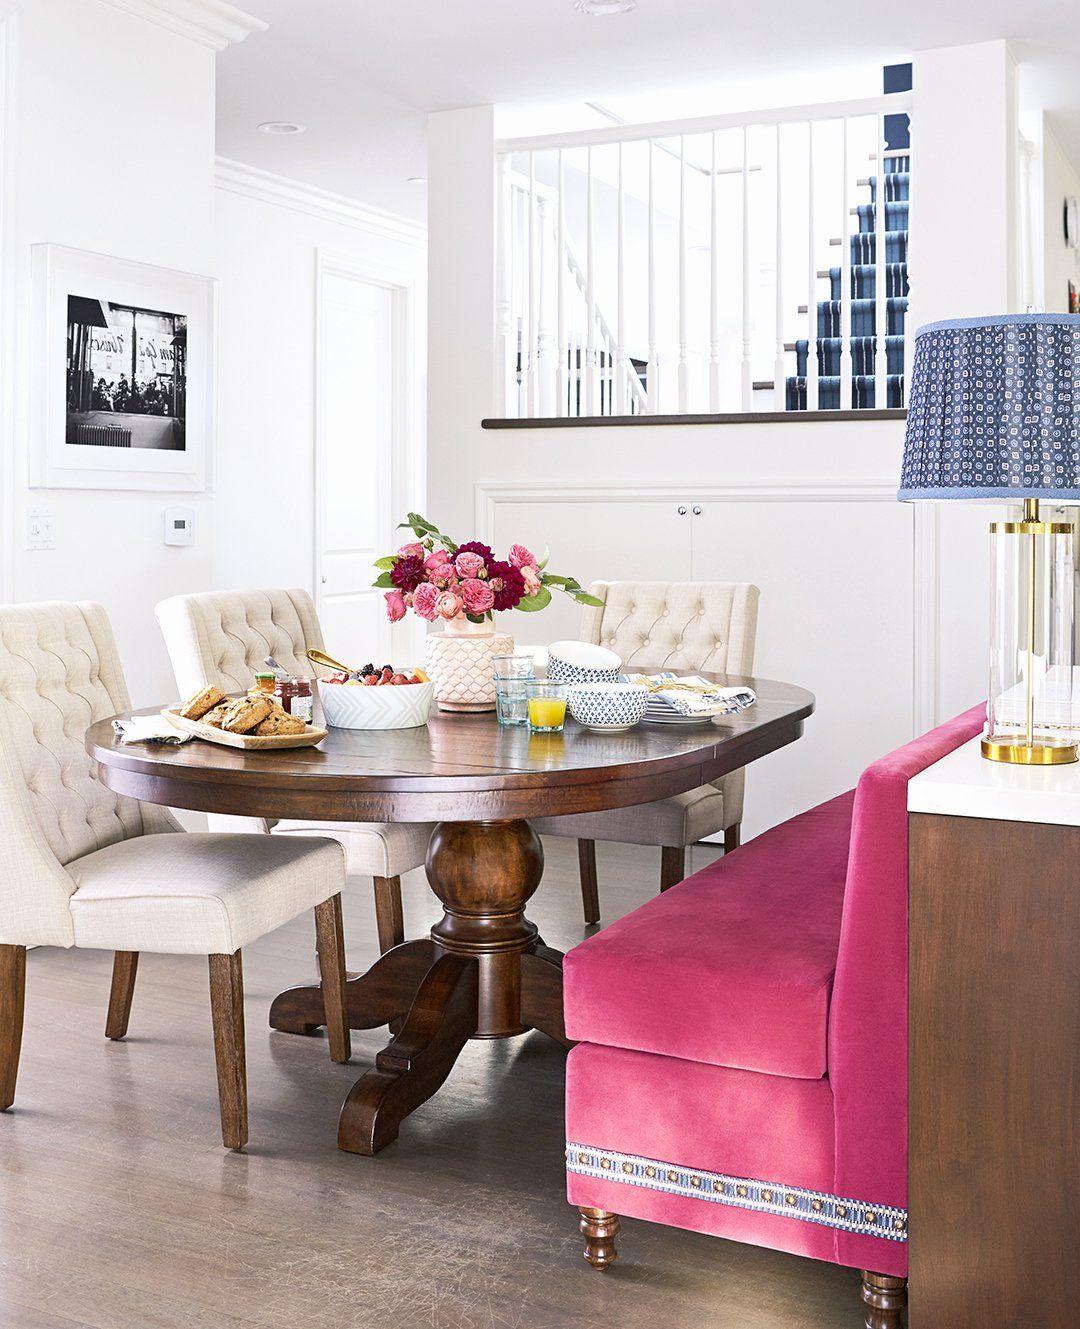 Banquette Dining Room Furniture Elegant Built In Banquette Ideas